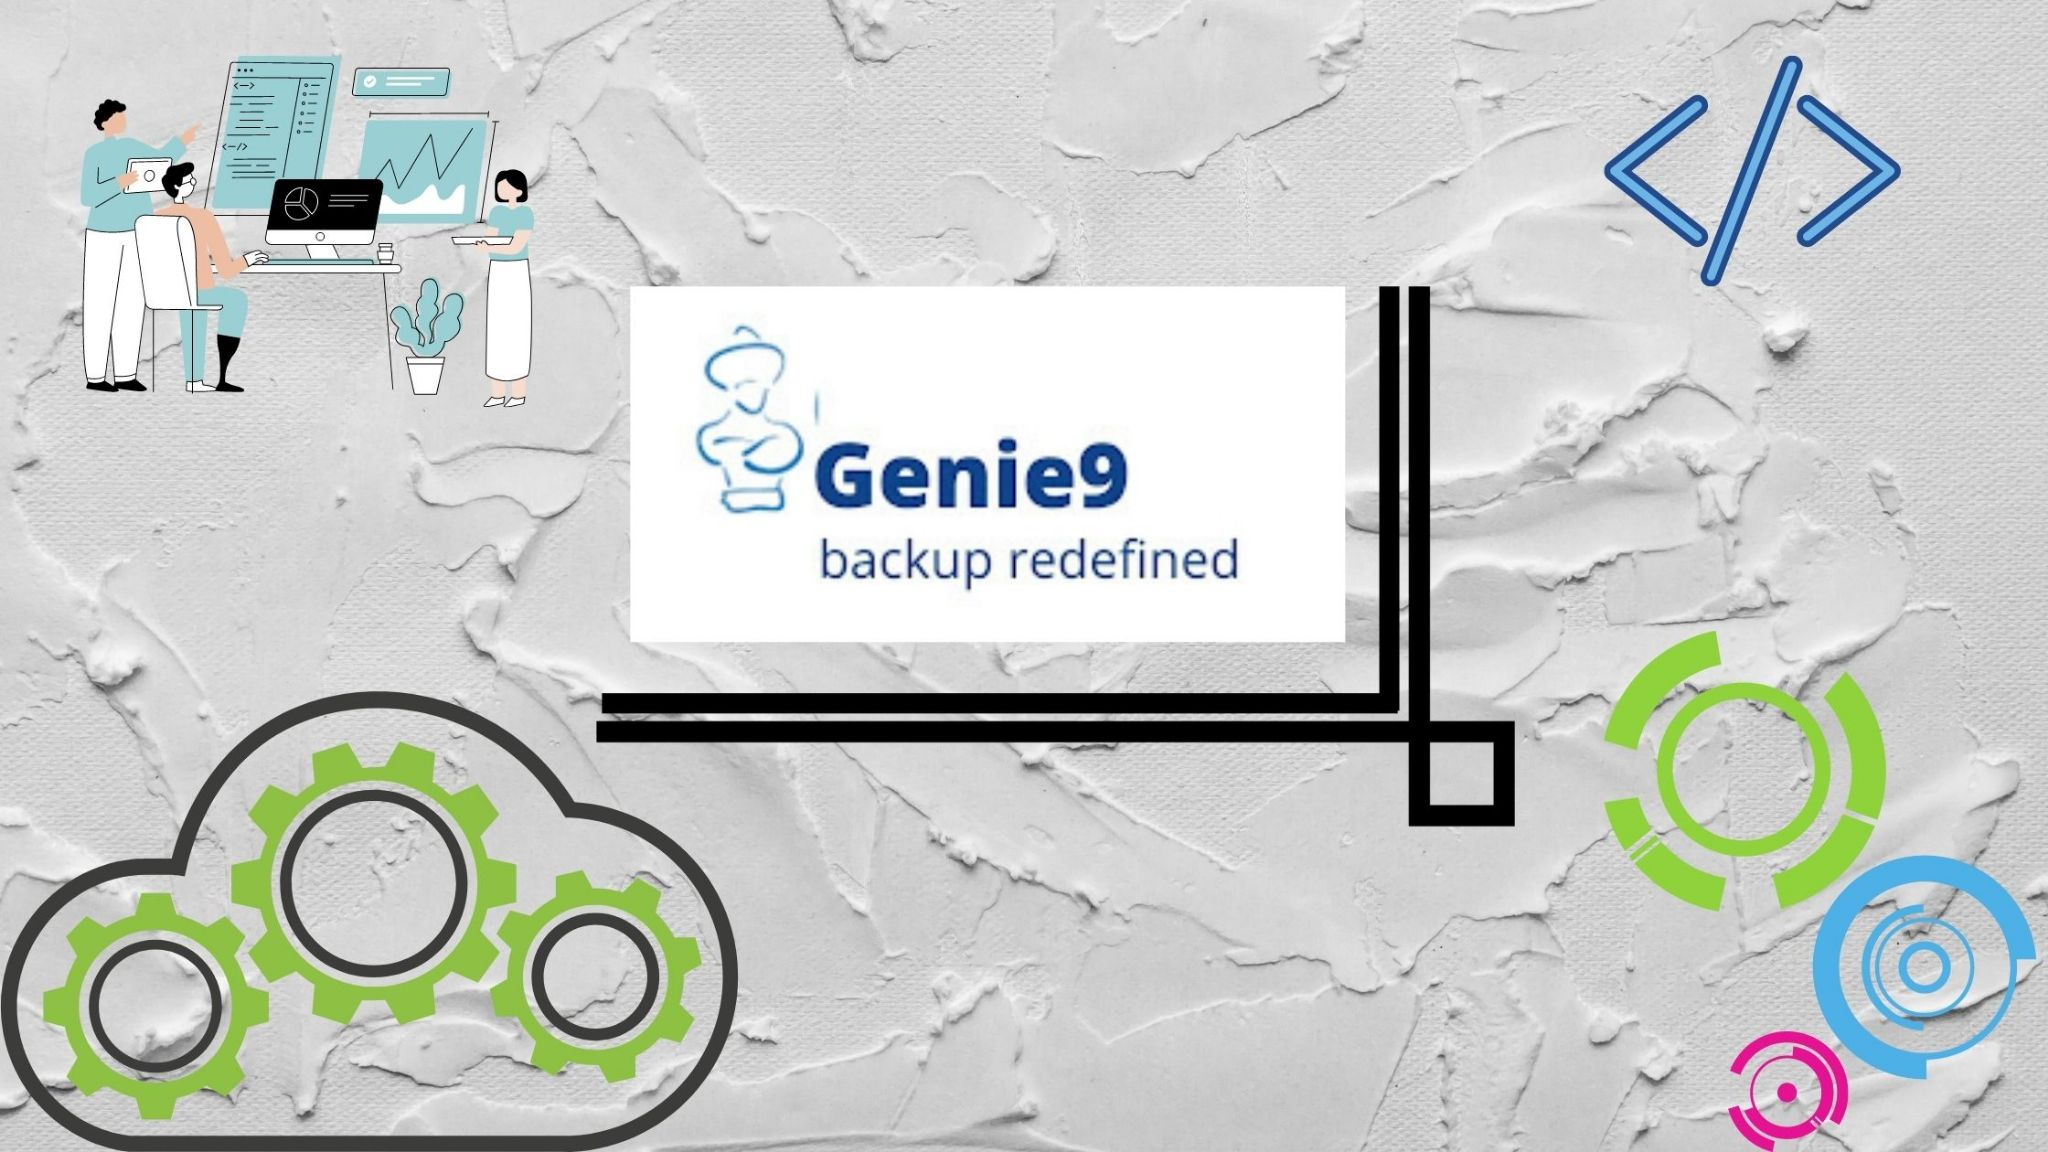 Genie Backup - backup software